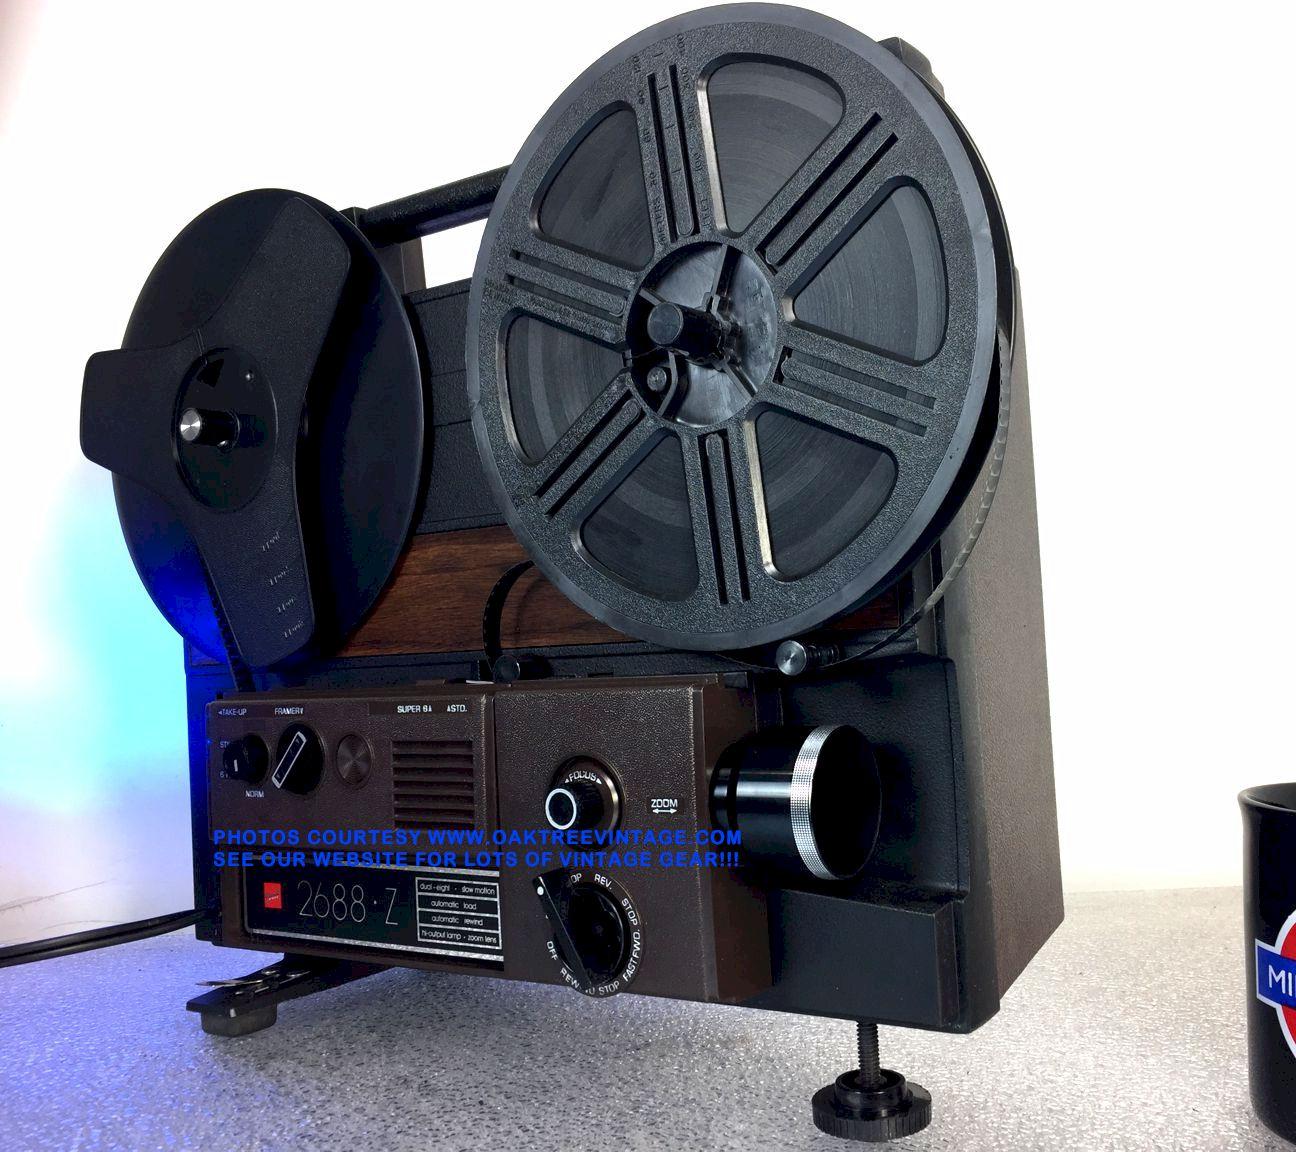 8mm & Super-8 Film projectors reel to reel film / movie